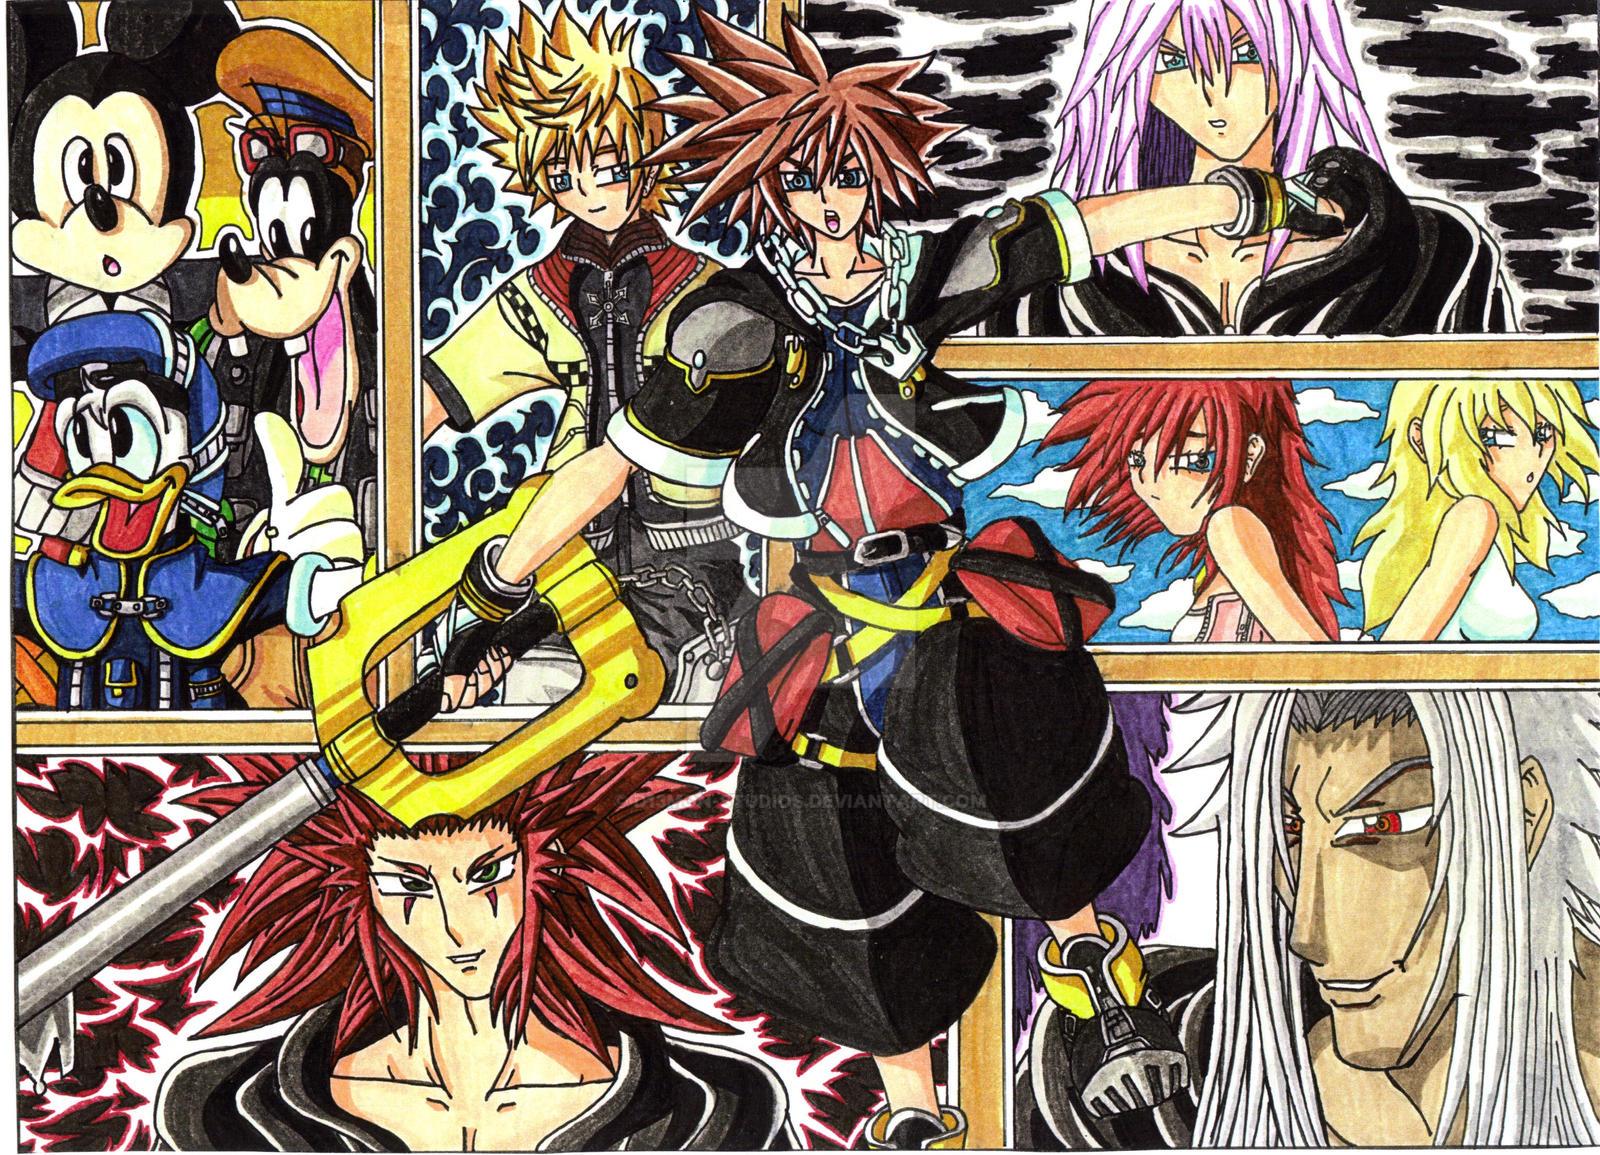 Sora Kingdom Hearts Lineart : Kingdom hearts on anime mangacf deviantart